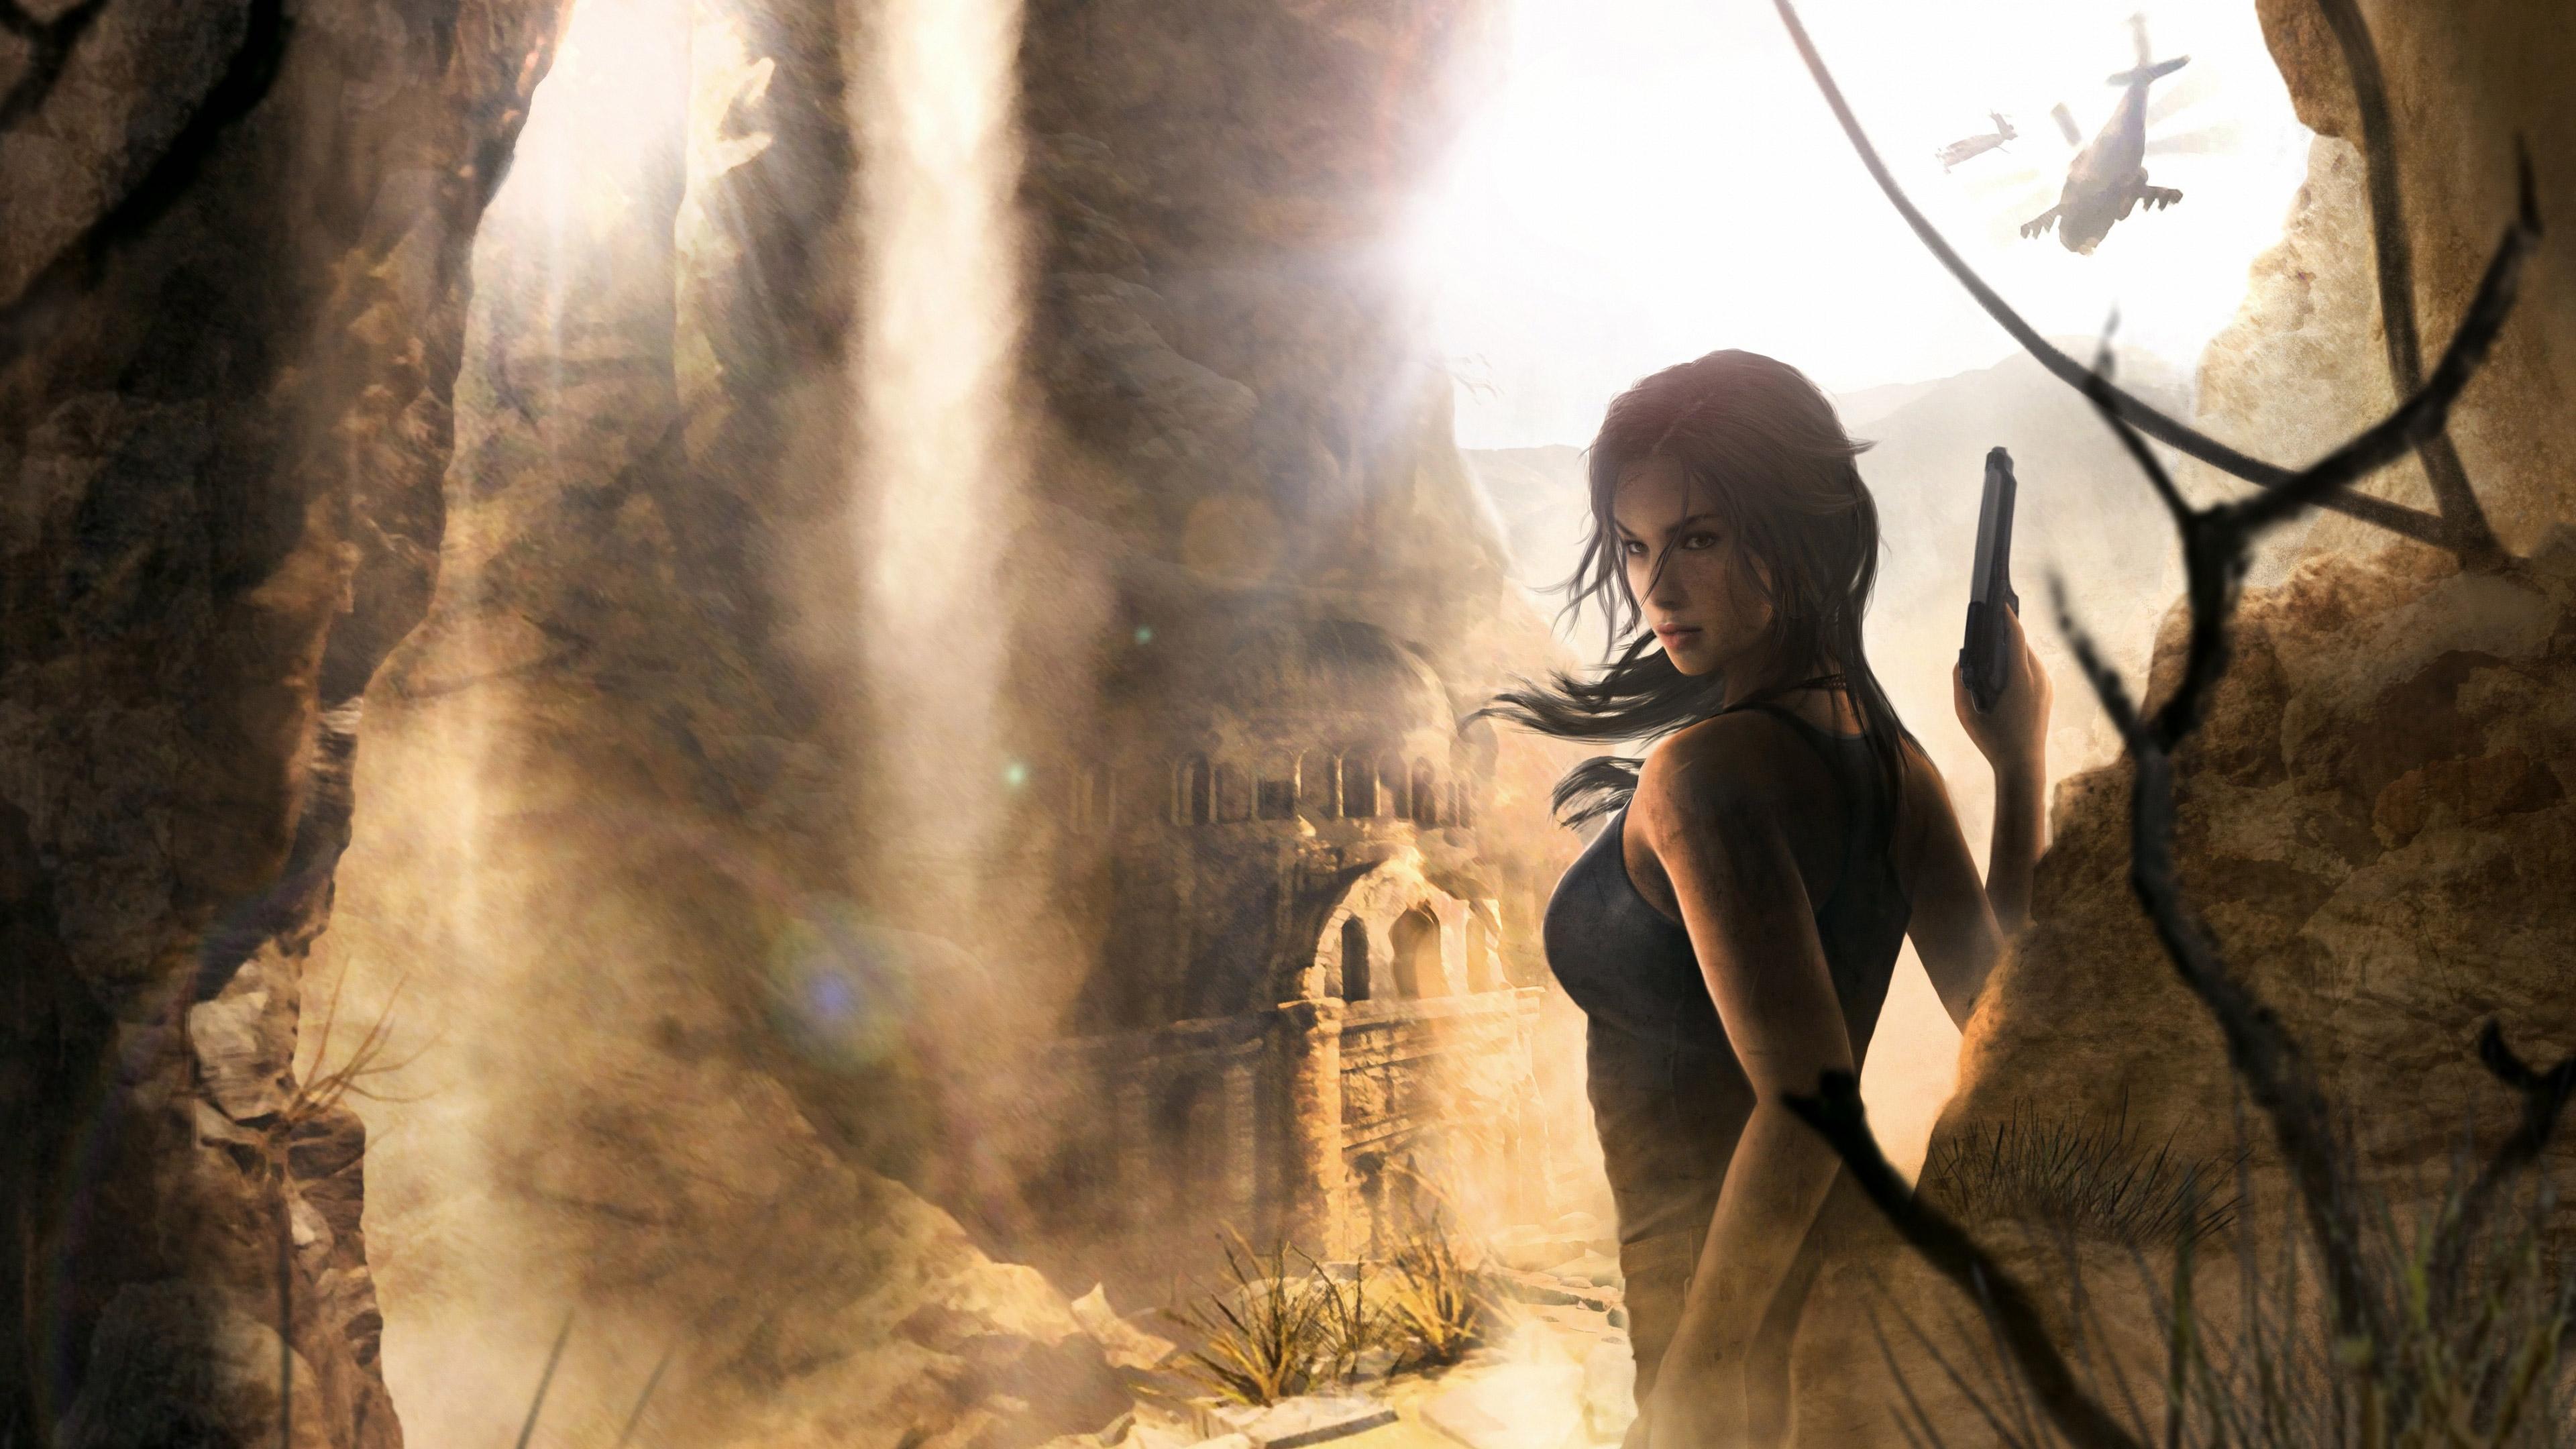 3840x2160 Lara Croft Tomb Raider Artwork 4k Hd 4k: Lara Croft 4k, HD Games, 4k Wallpapers, Images